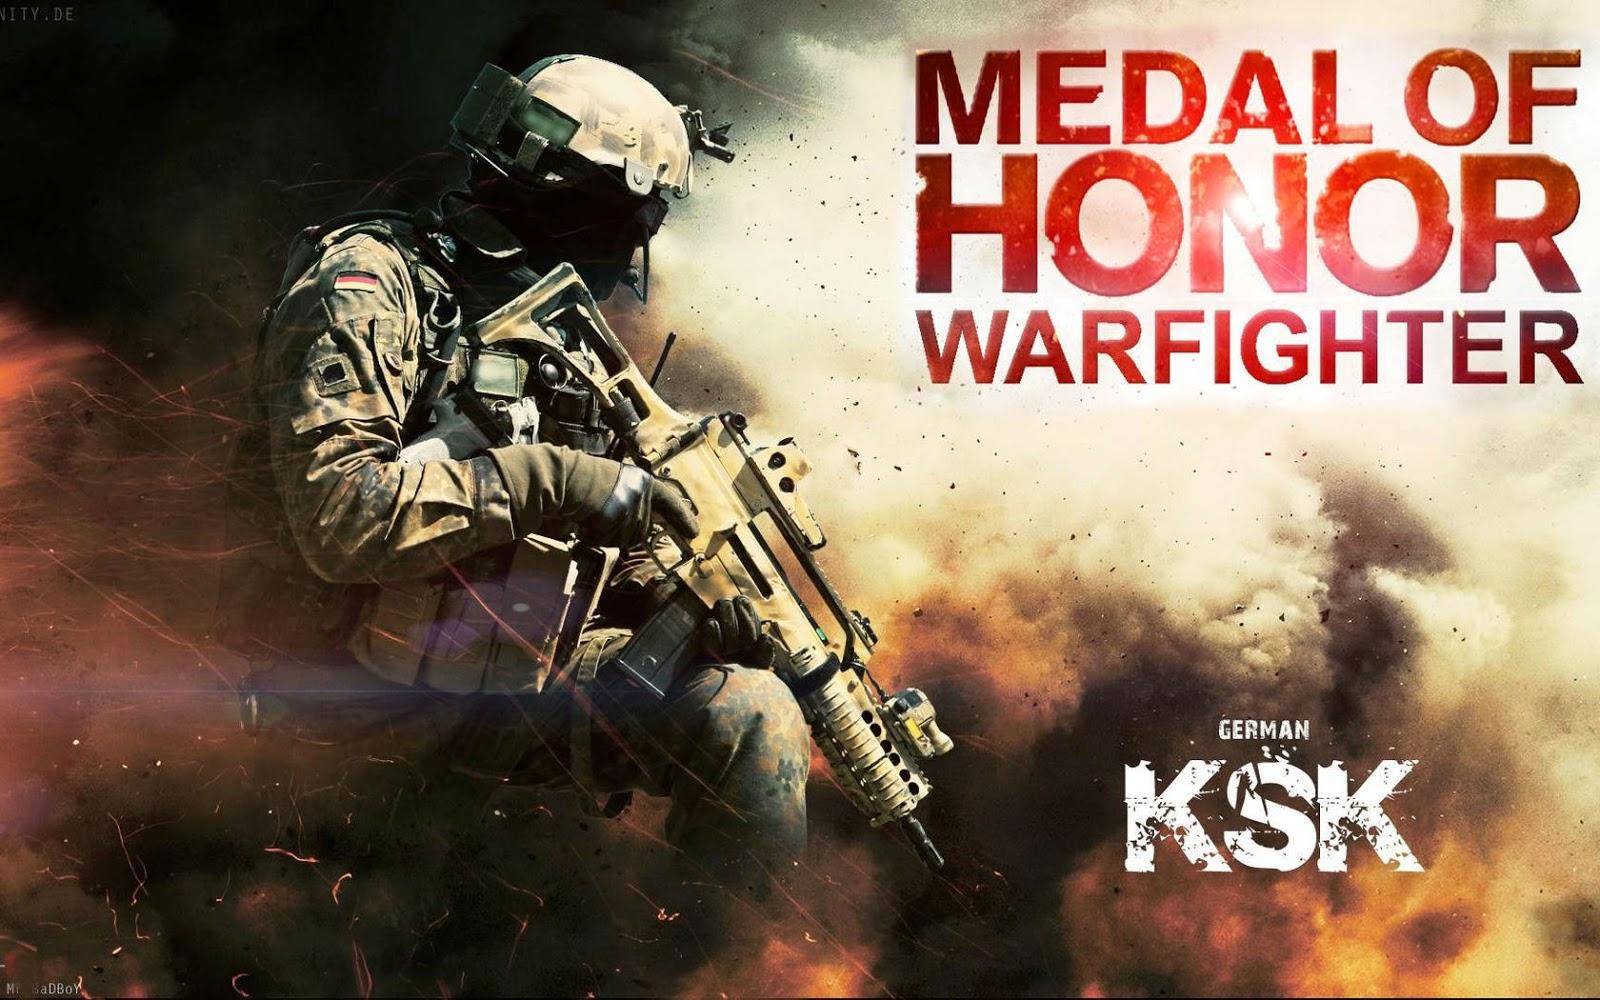 Black Ops Wallpaper Hd Hd Wallpapers Medal Of Honor Warfighter Hd Wallpapers